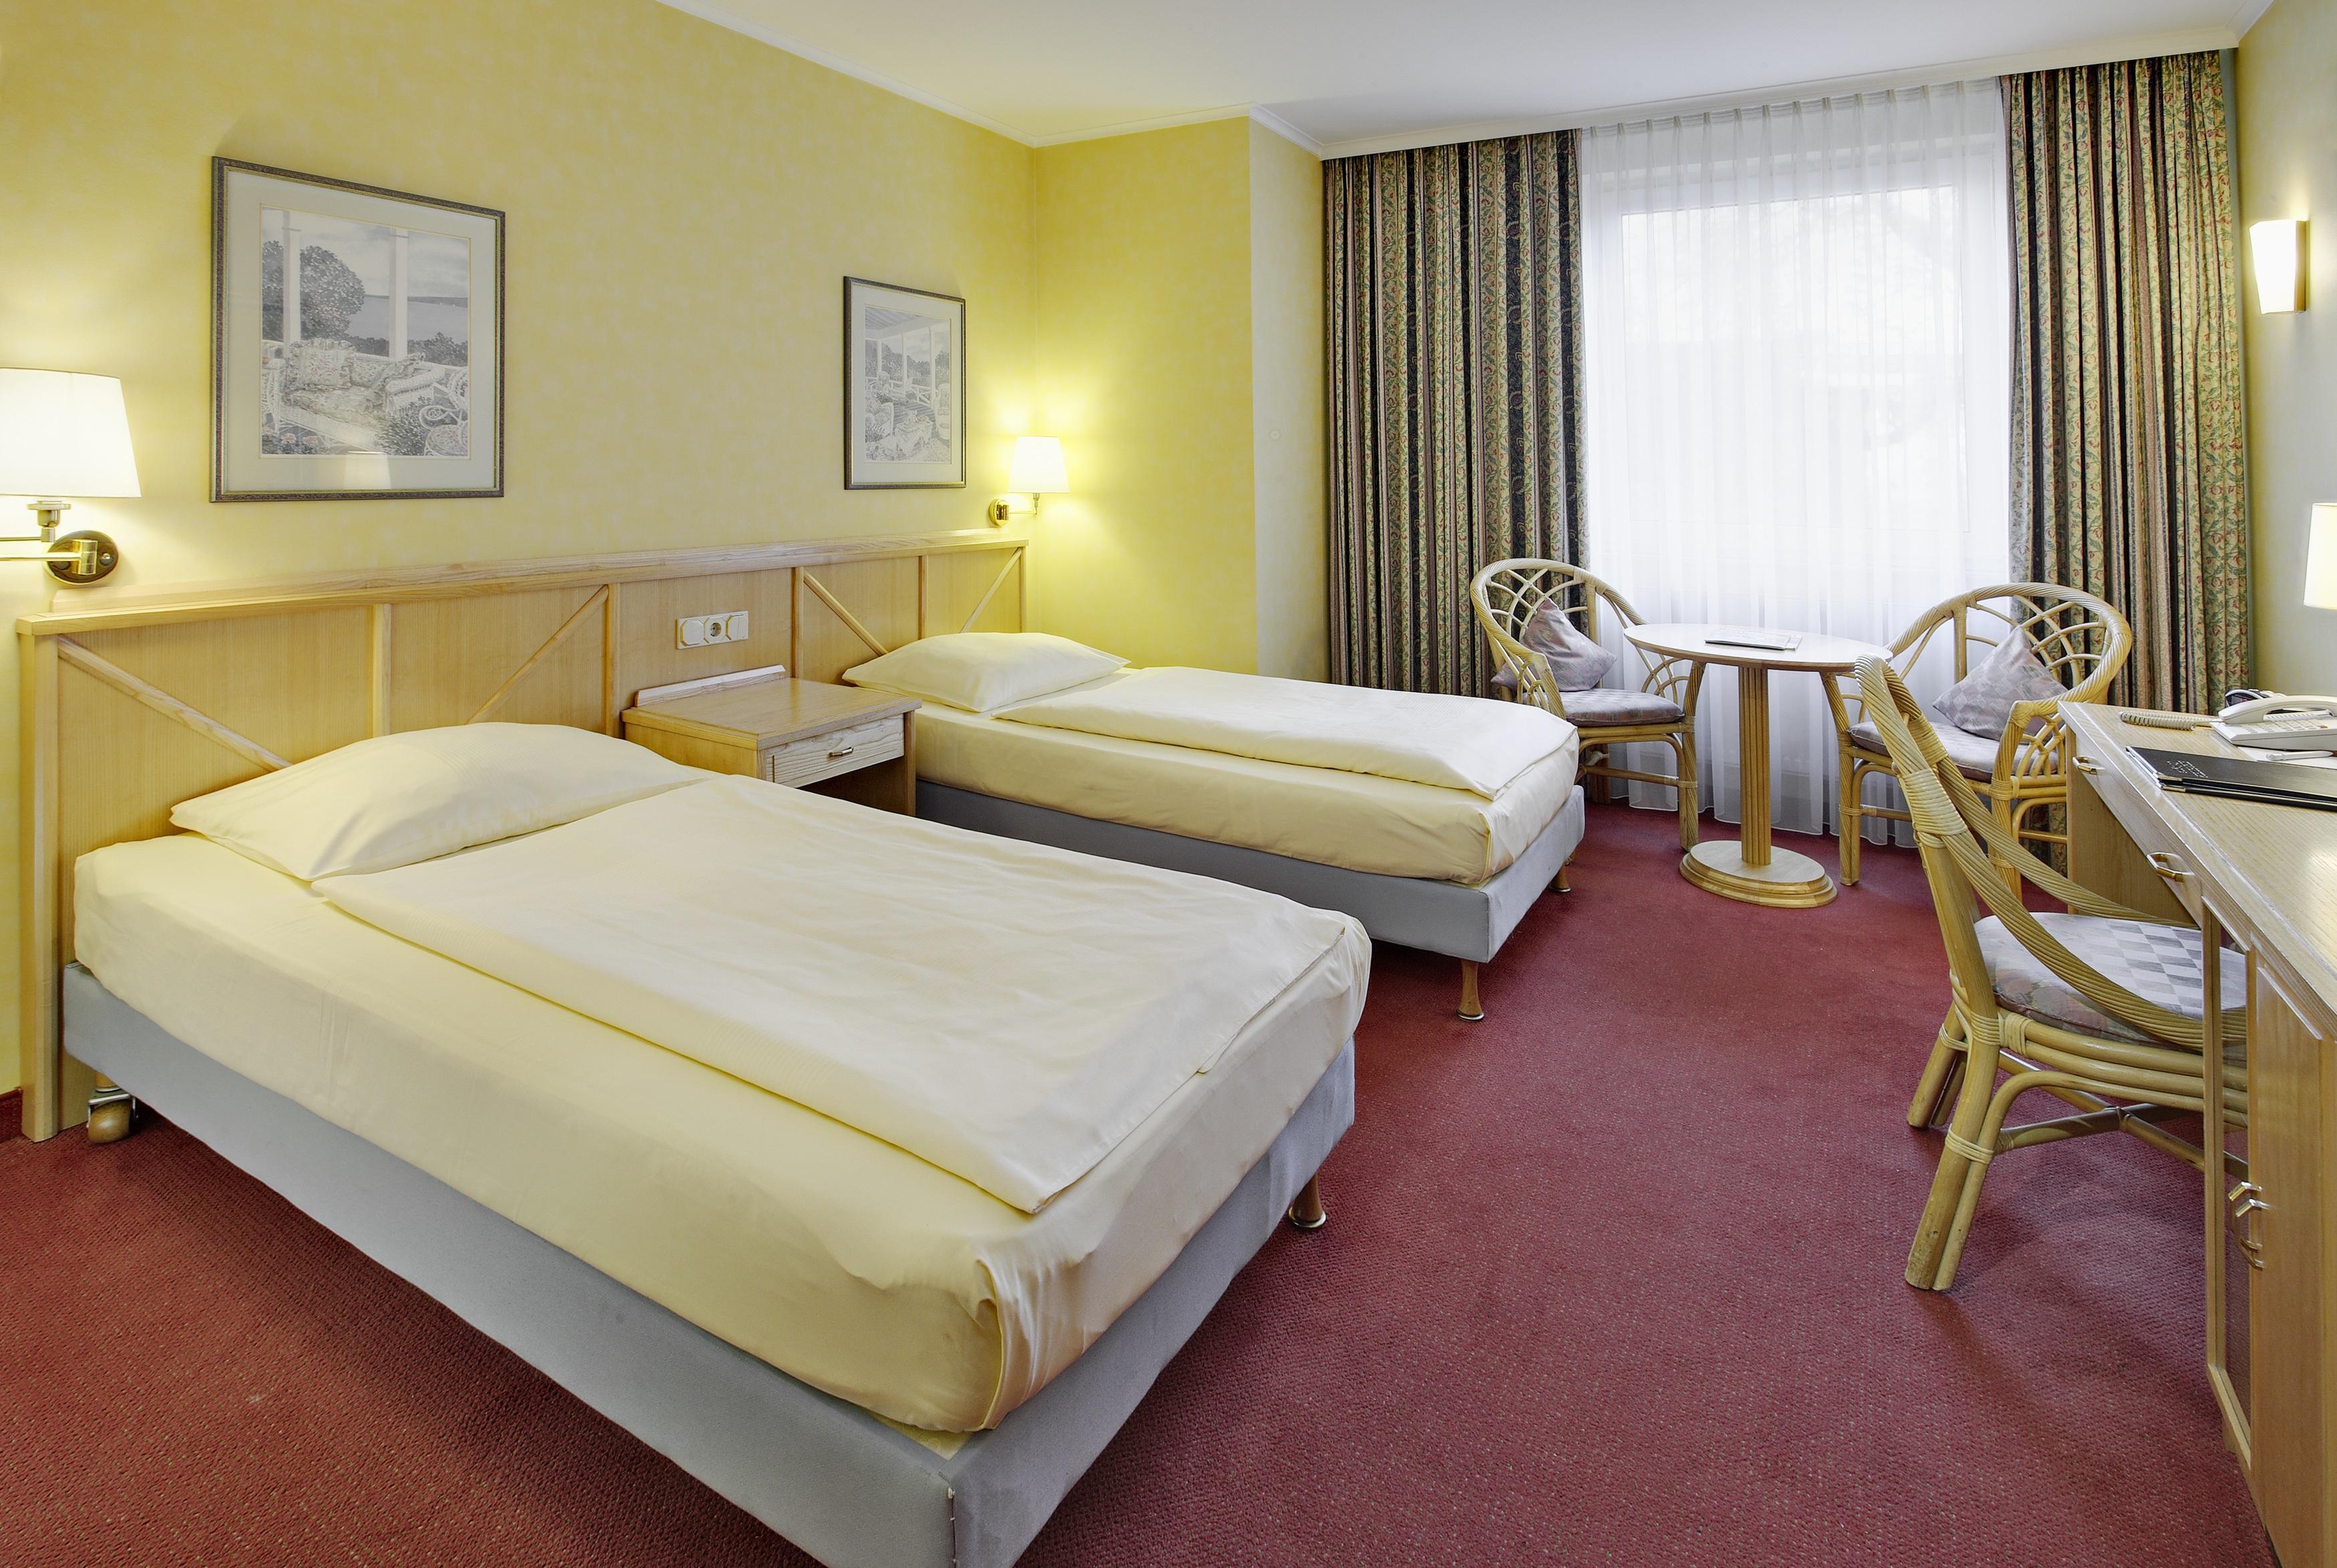 Hotel Koln Dom Lage Tryp By Wyndham Hotel Koln City Centre